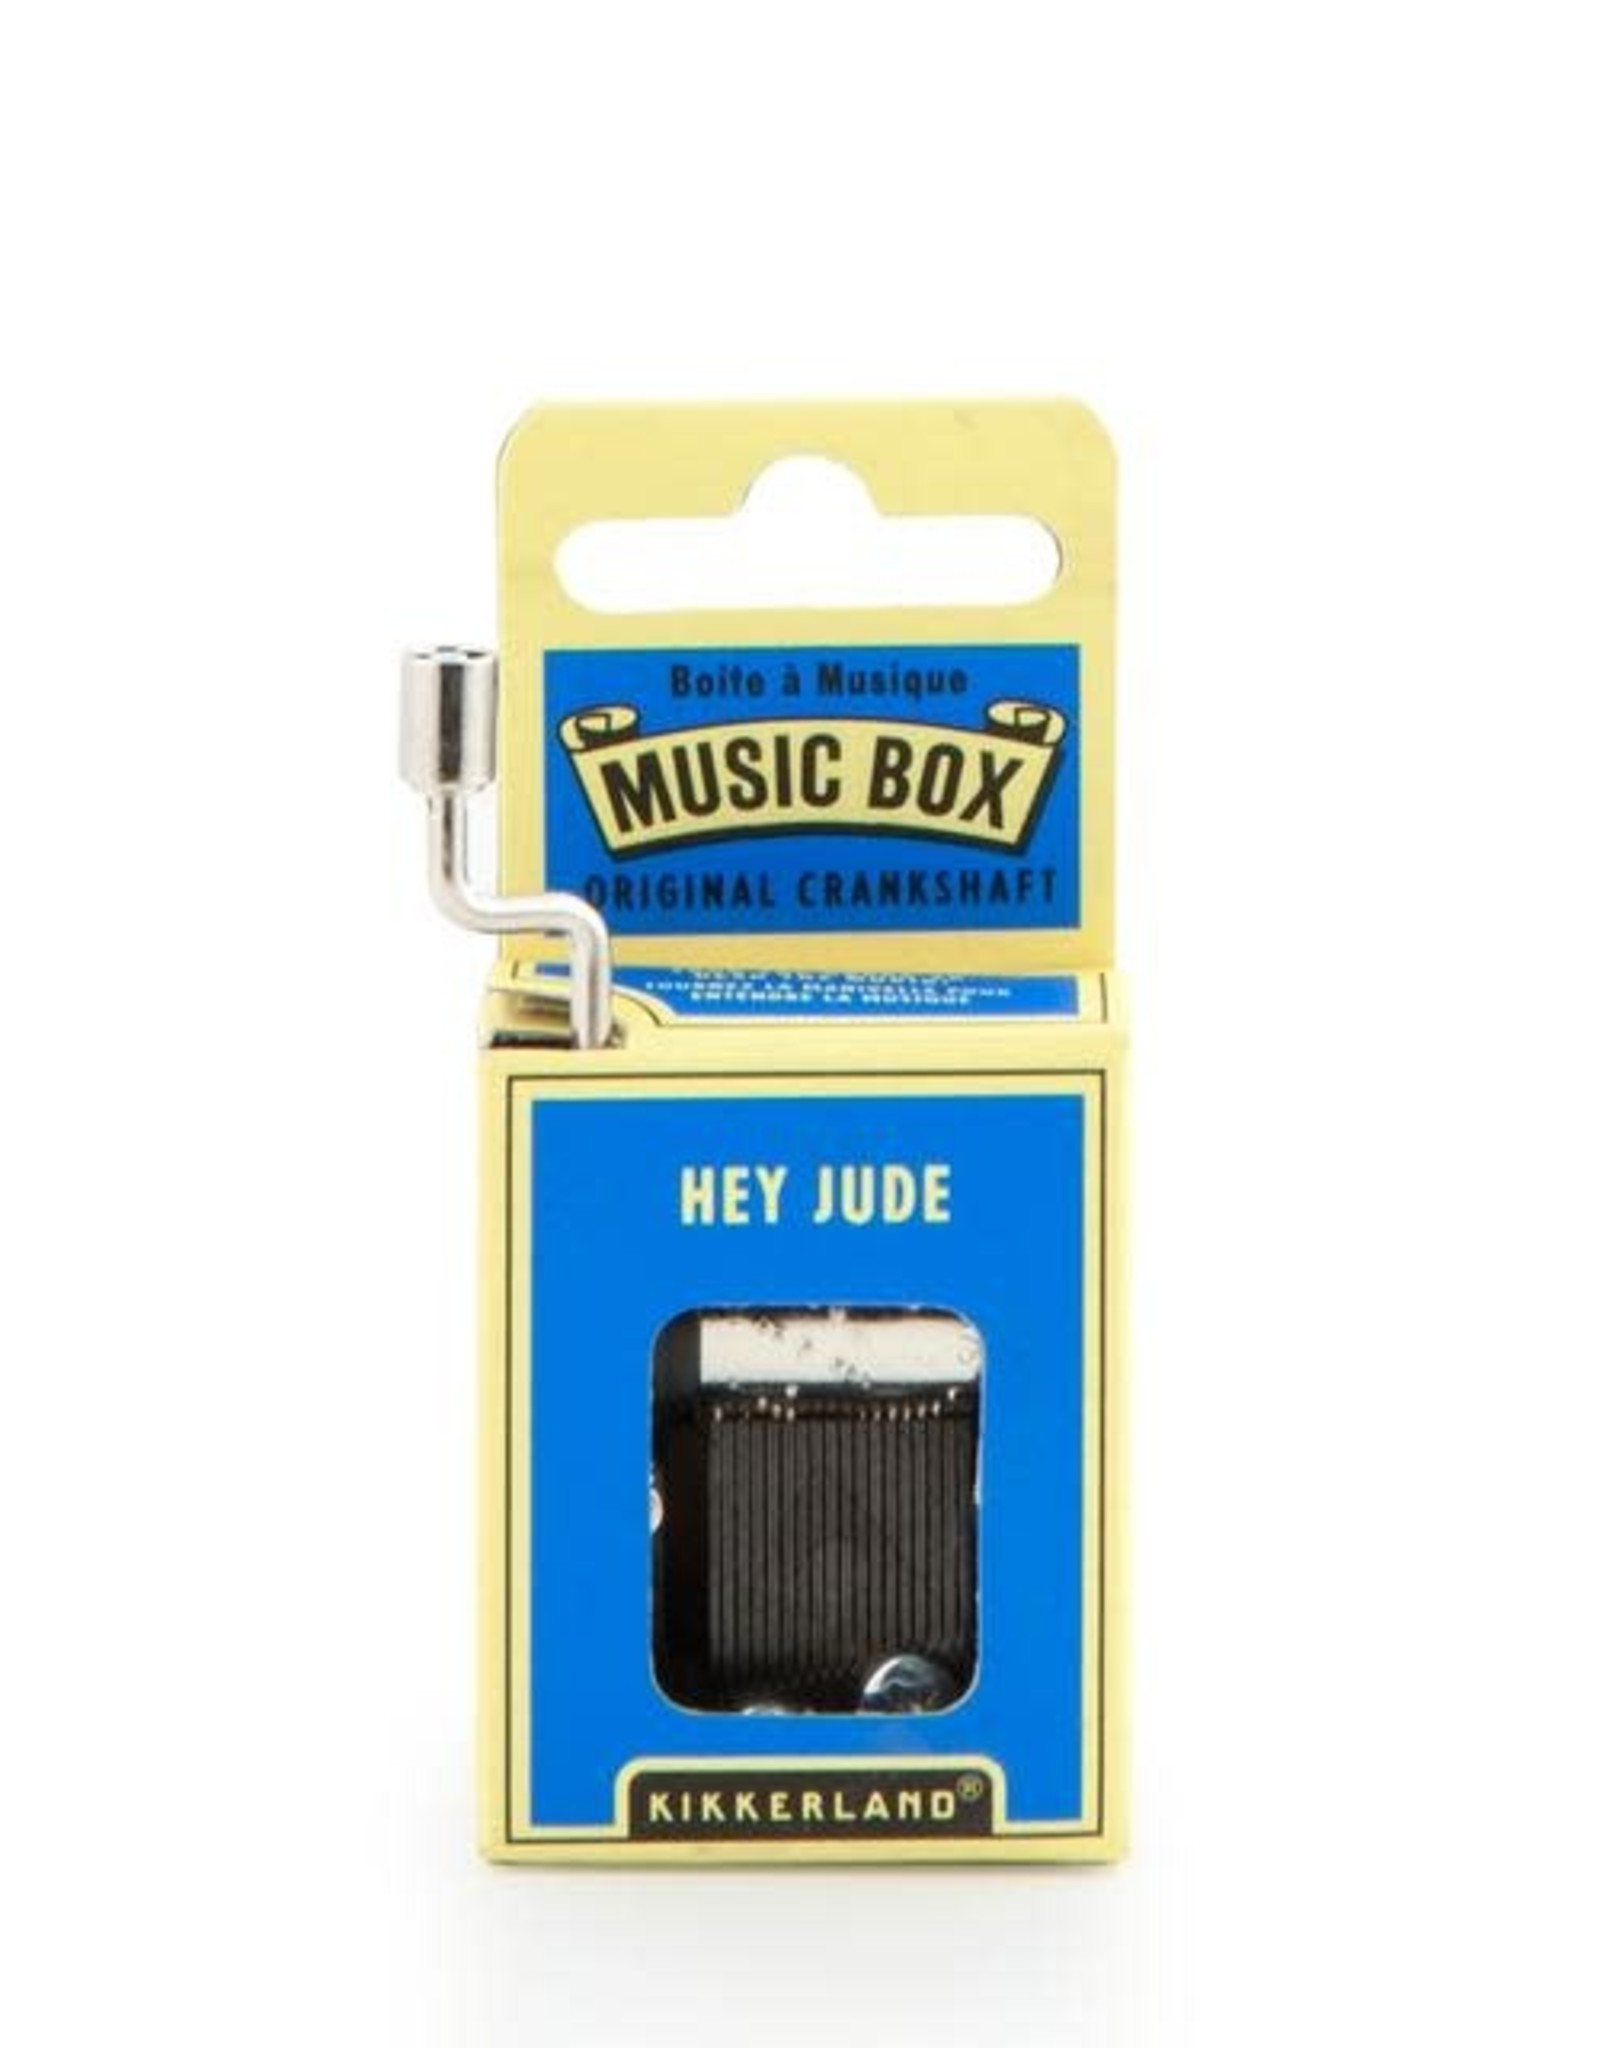 Kikkerland Hand Crank Music Box, Hey Jude - Kikkerland